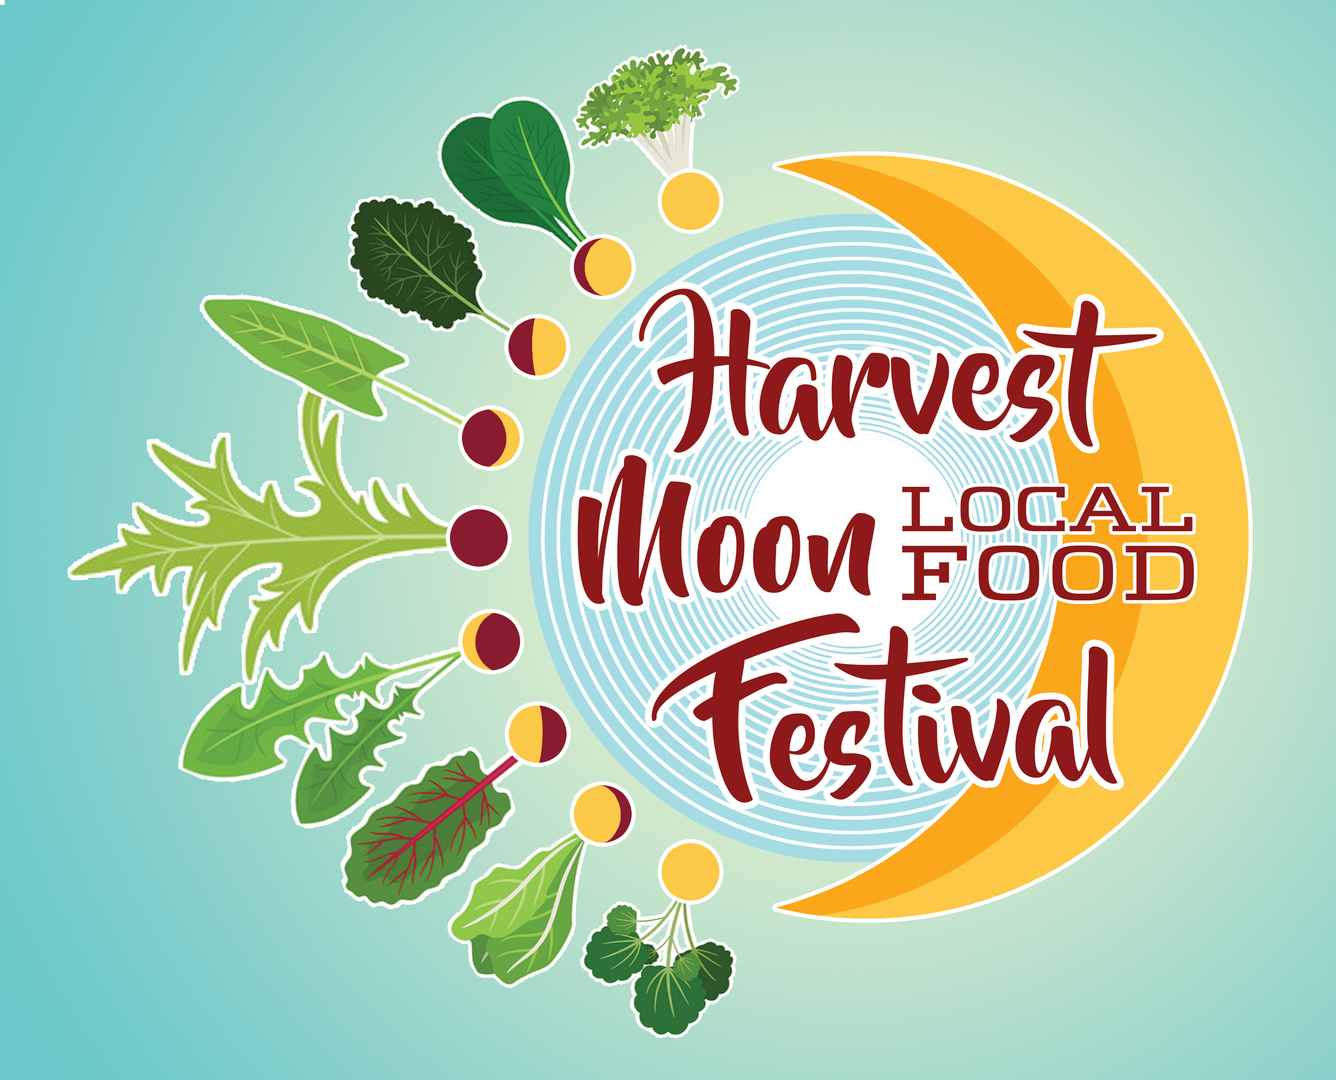 Harvest Moon Local Food Festival